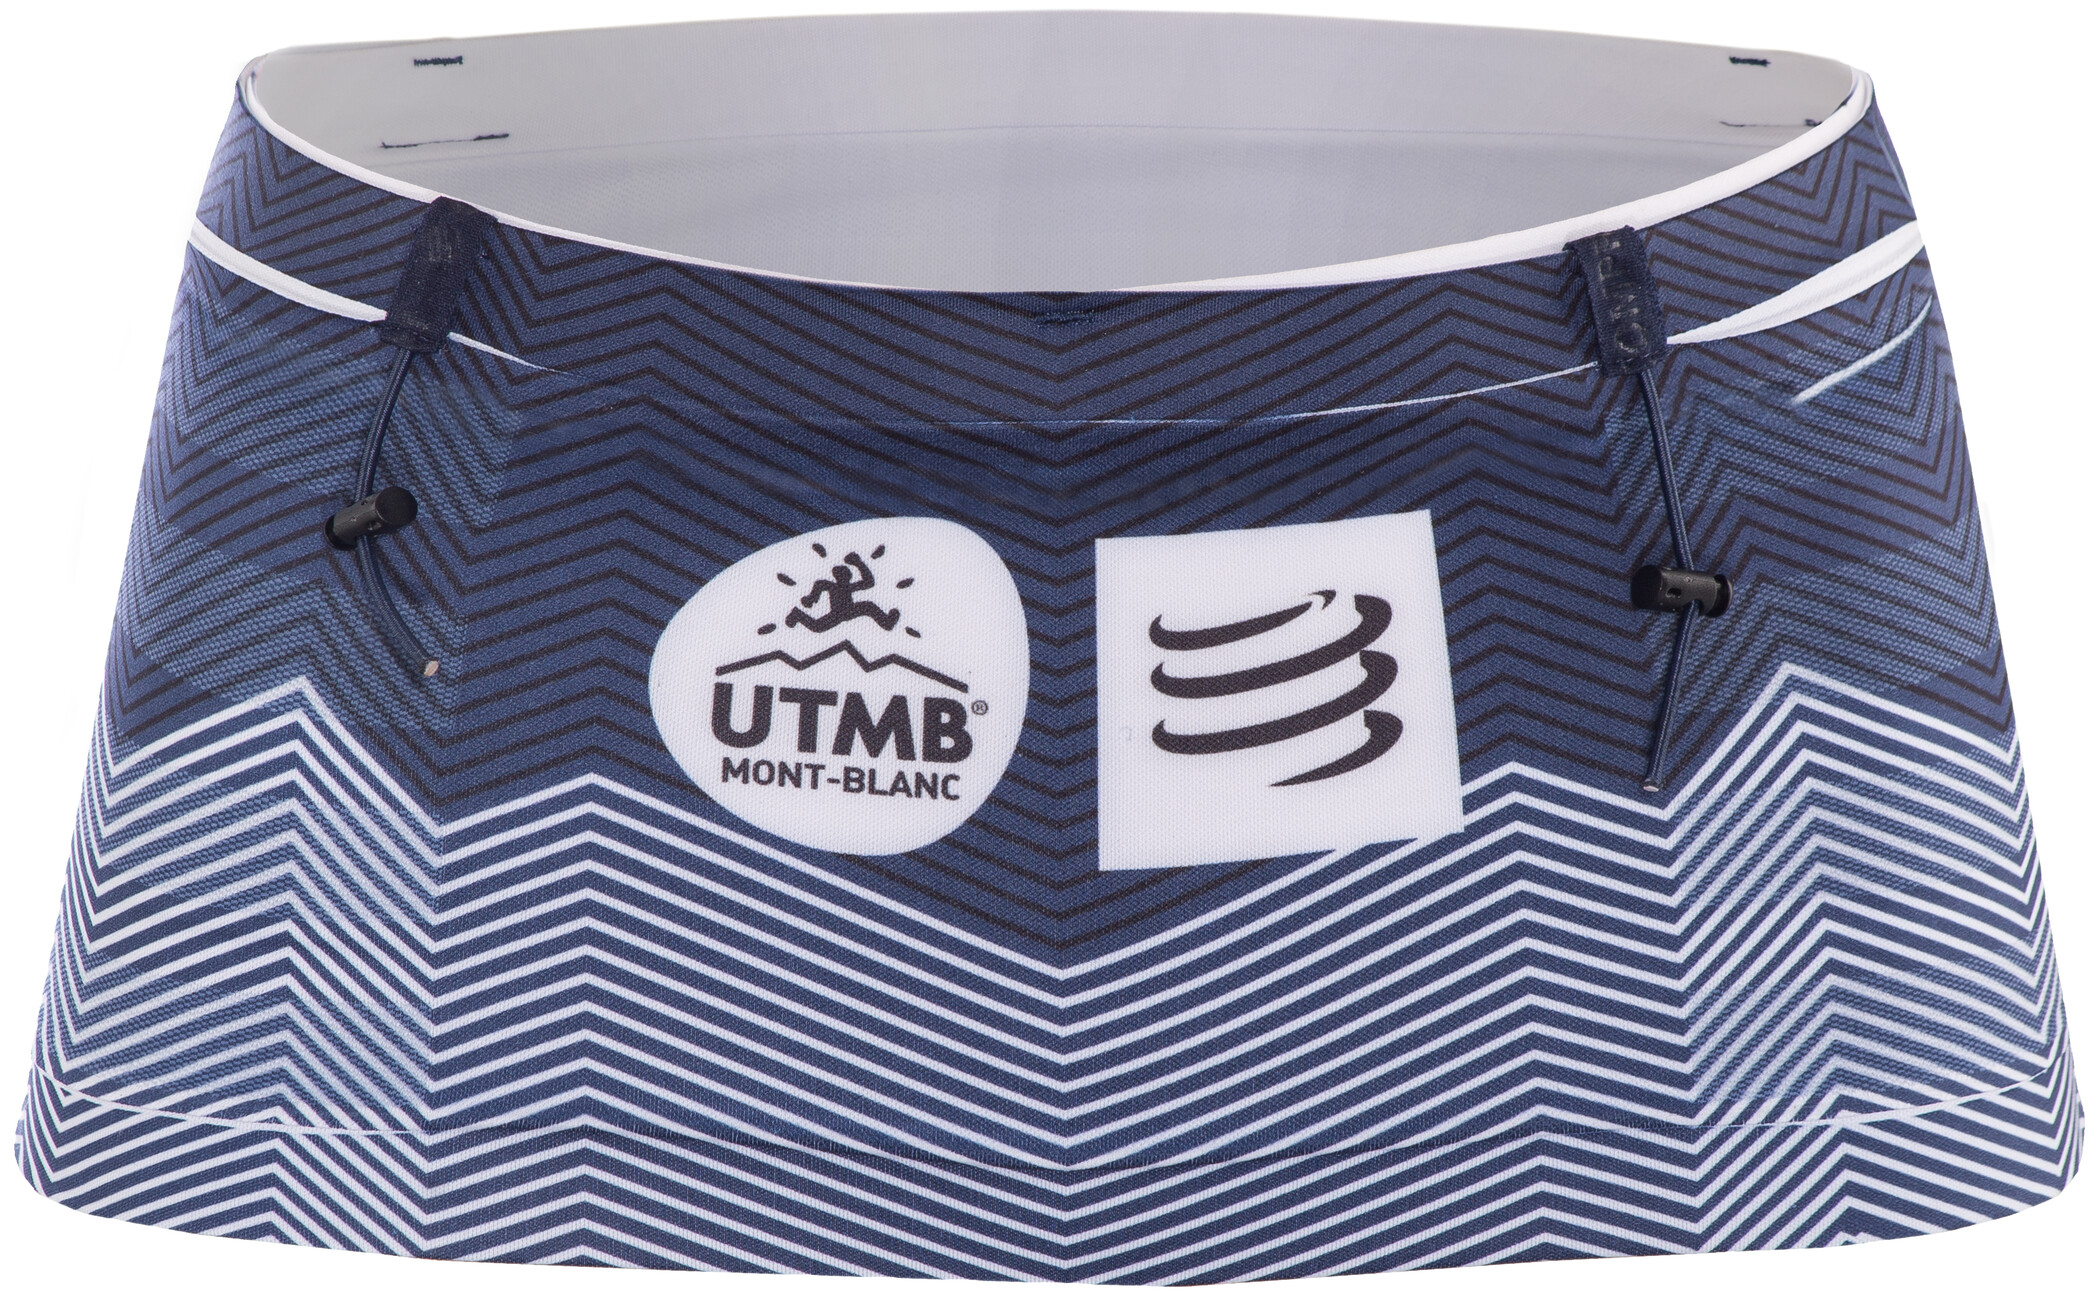 Mens Swim Trunks Summer 3D Print Weimaraner Vintage Florals Dog Casual Athletic Swimming Short